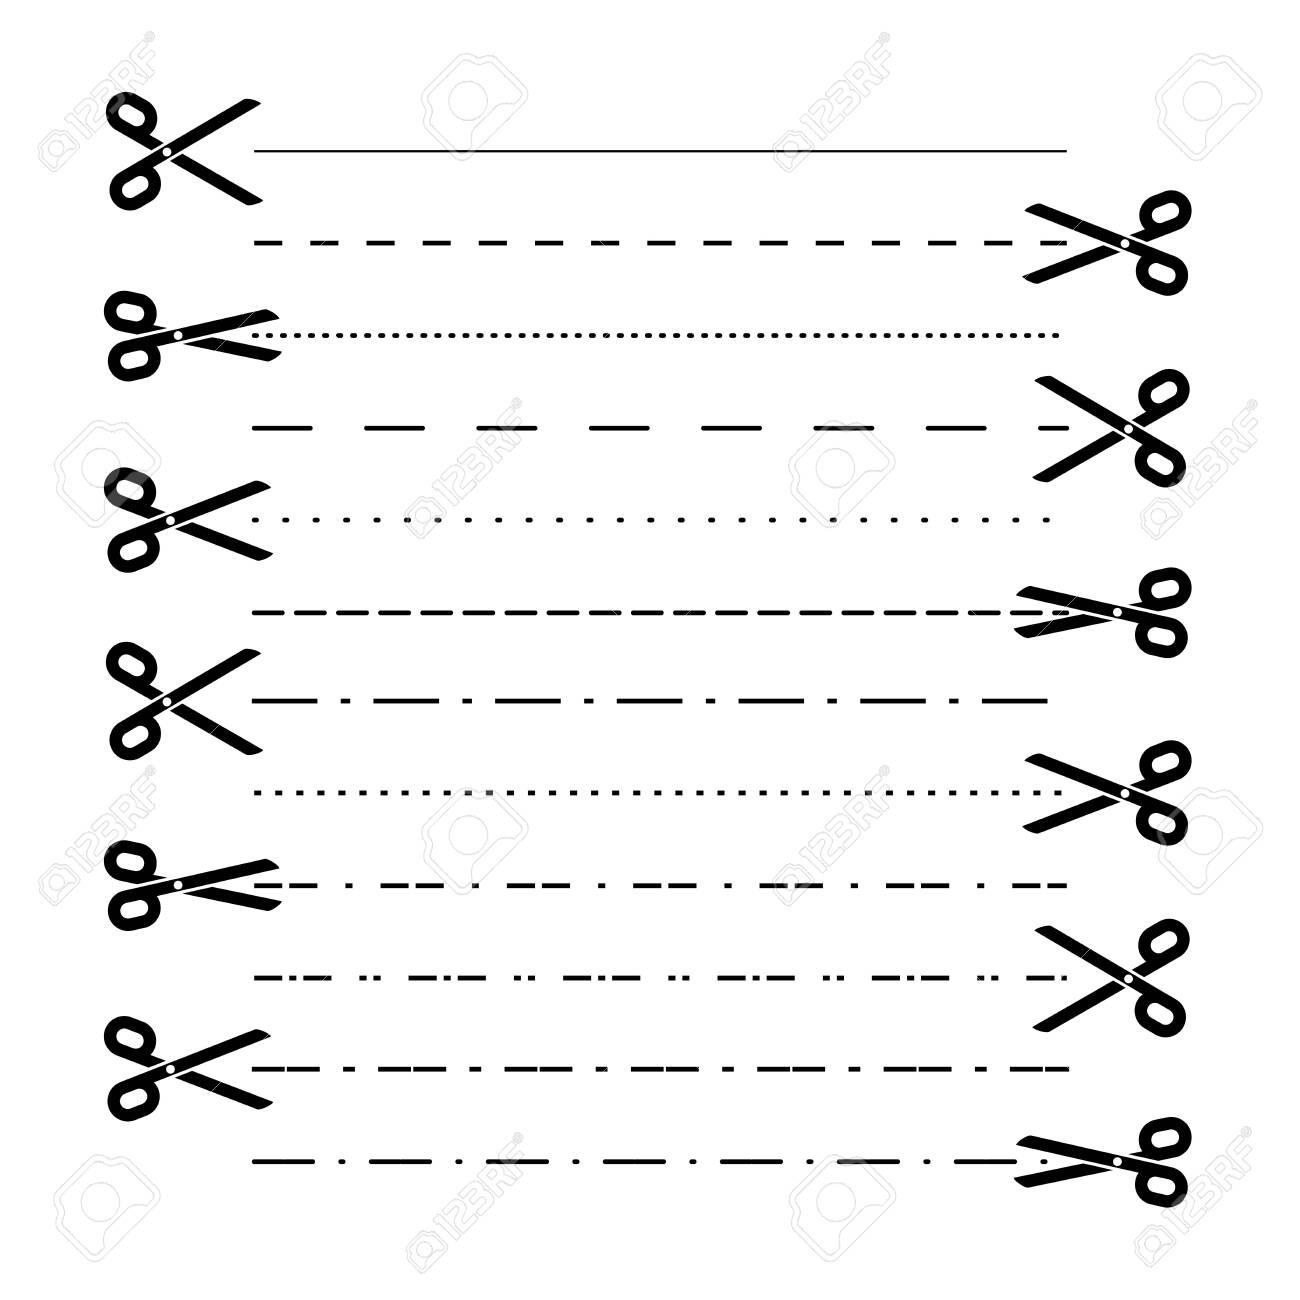 Scissors vectors with cut lines, dot, dashed lines. Dividing lines cutout. Vector - 124034295